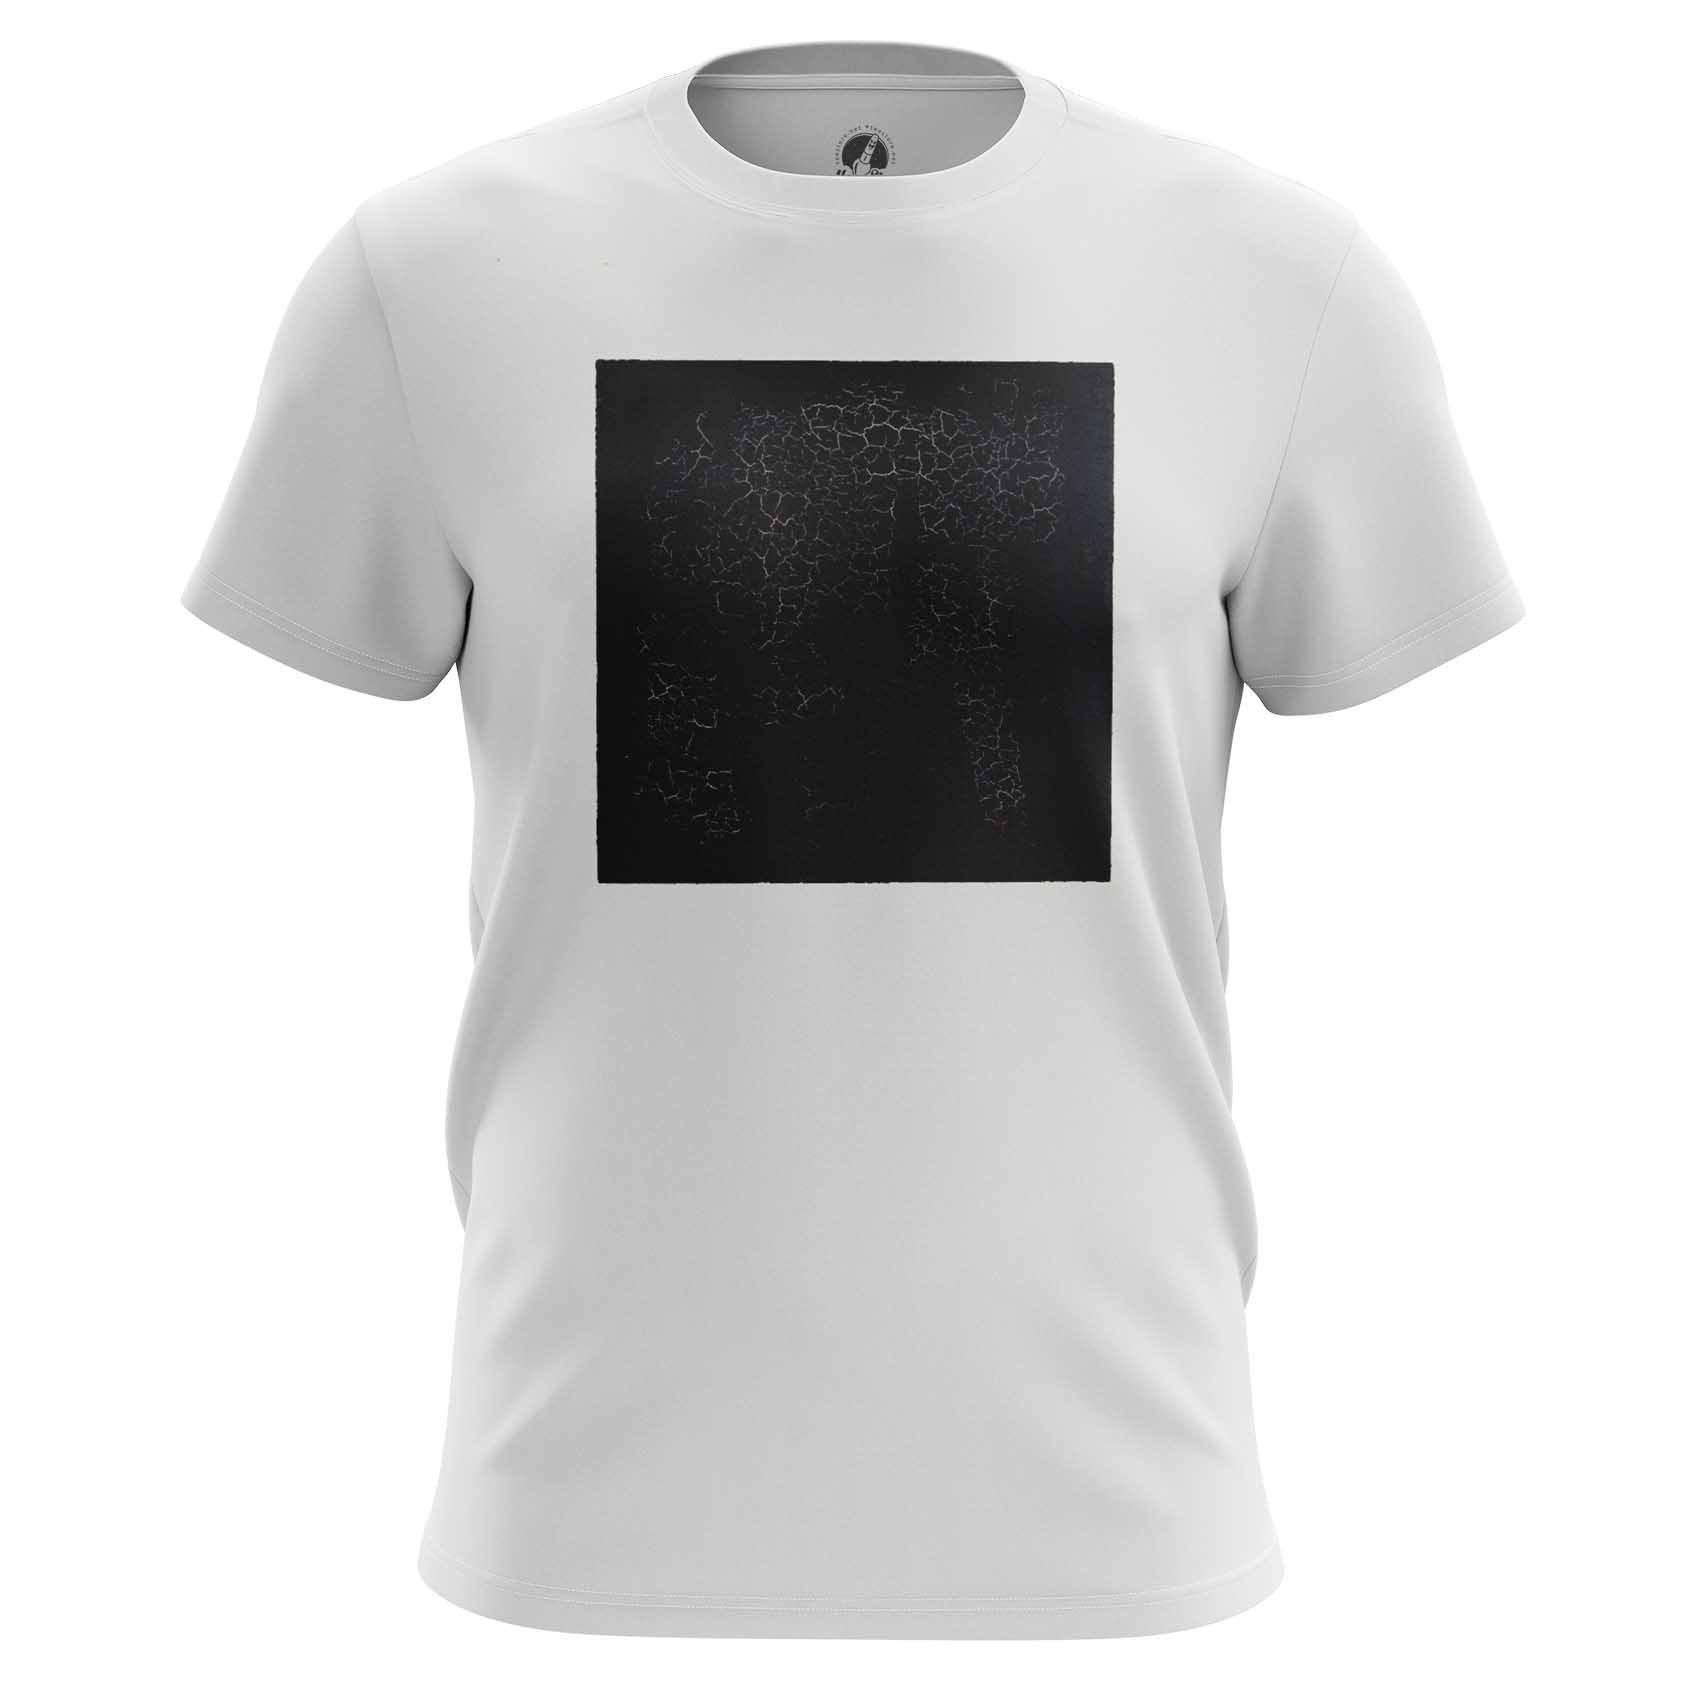 Merch T-Shirt Black Square Malevich Fine Art Artwork